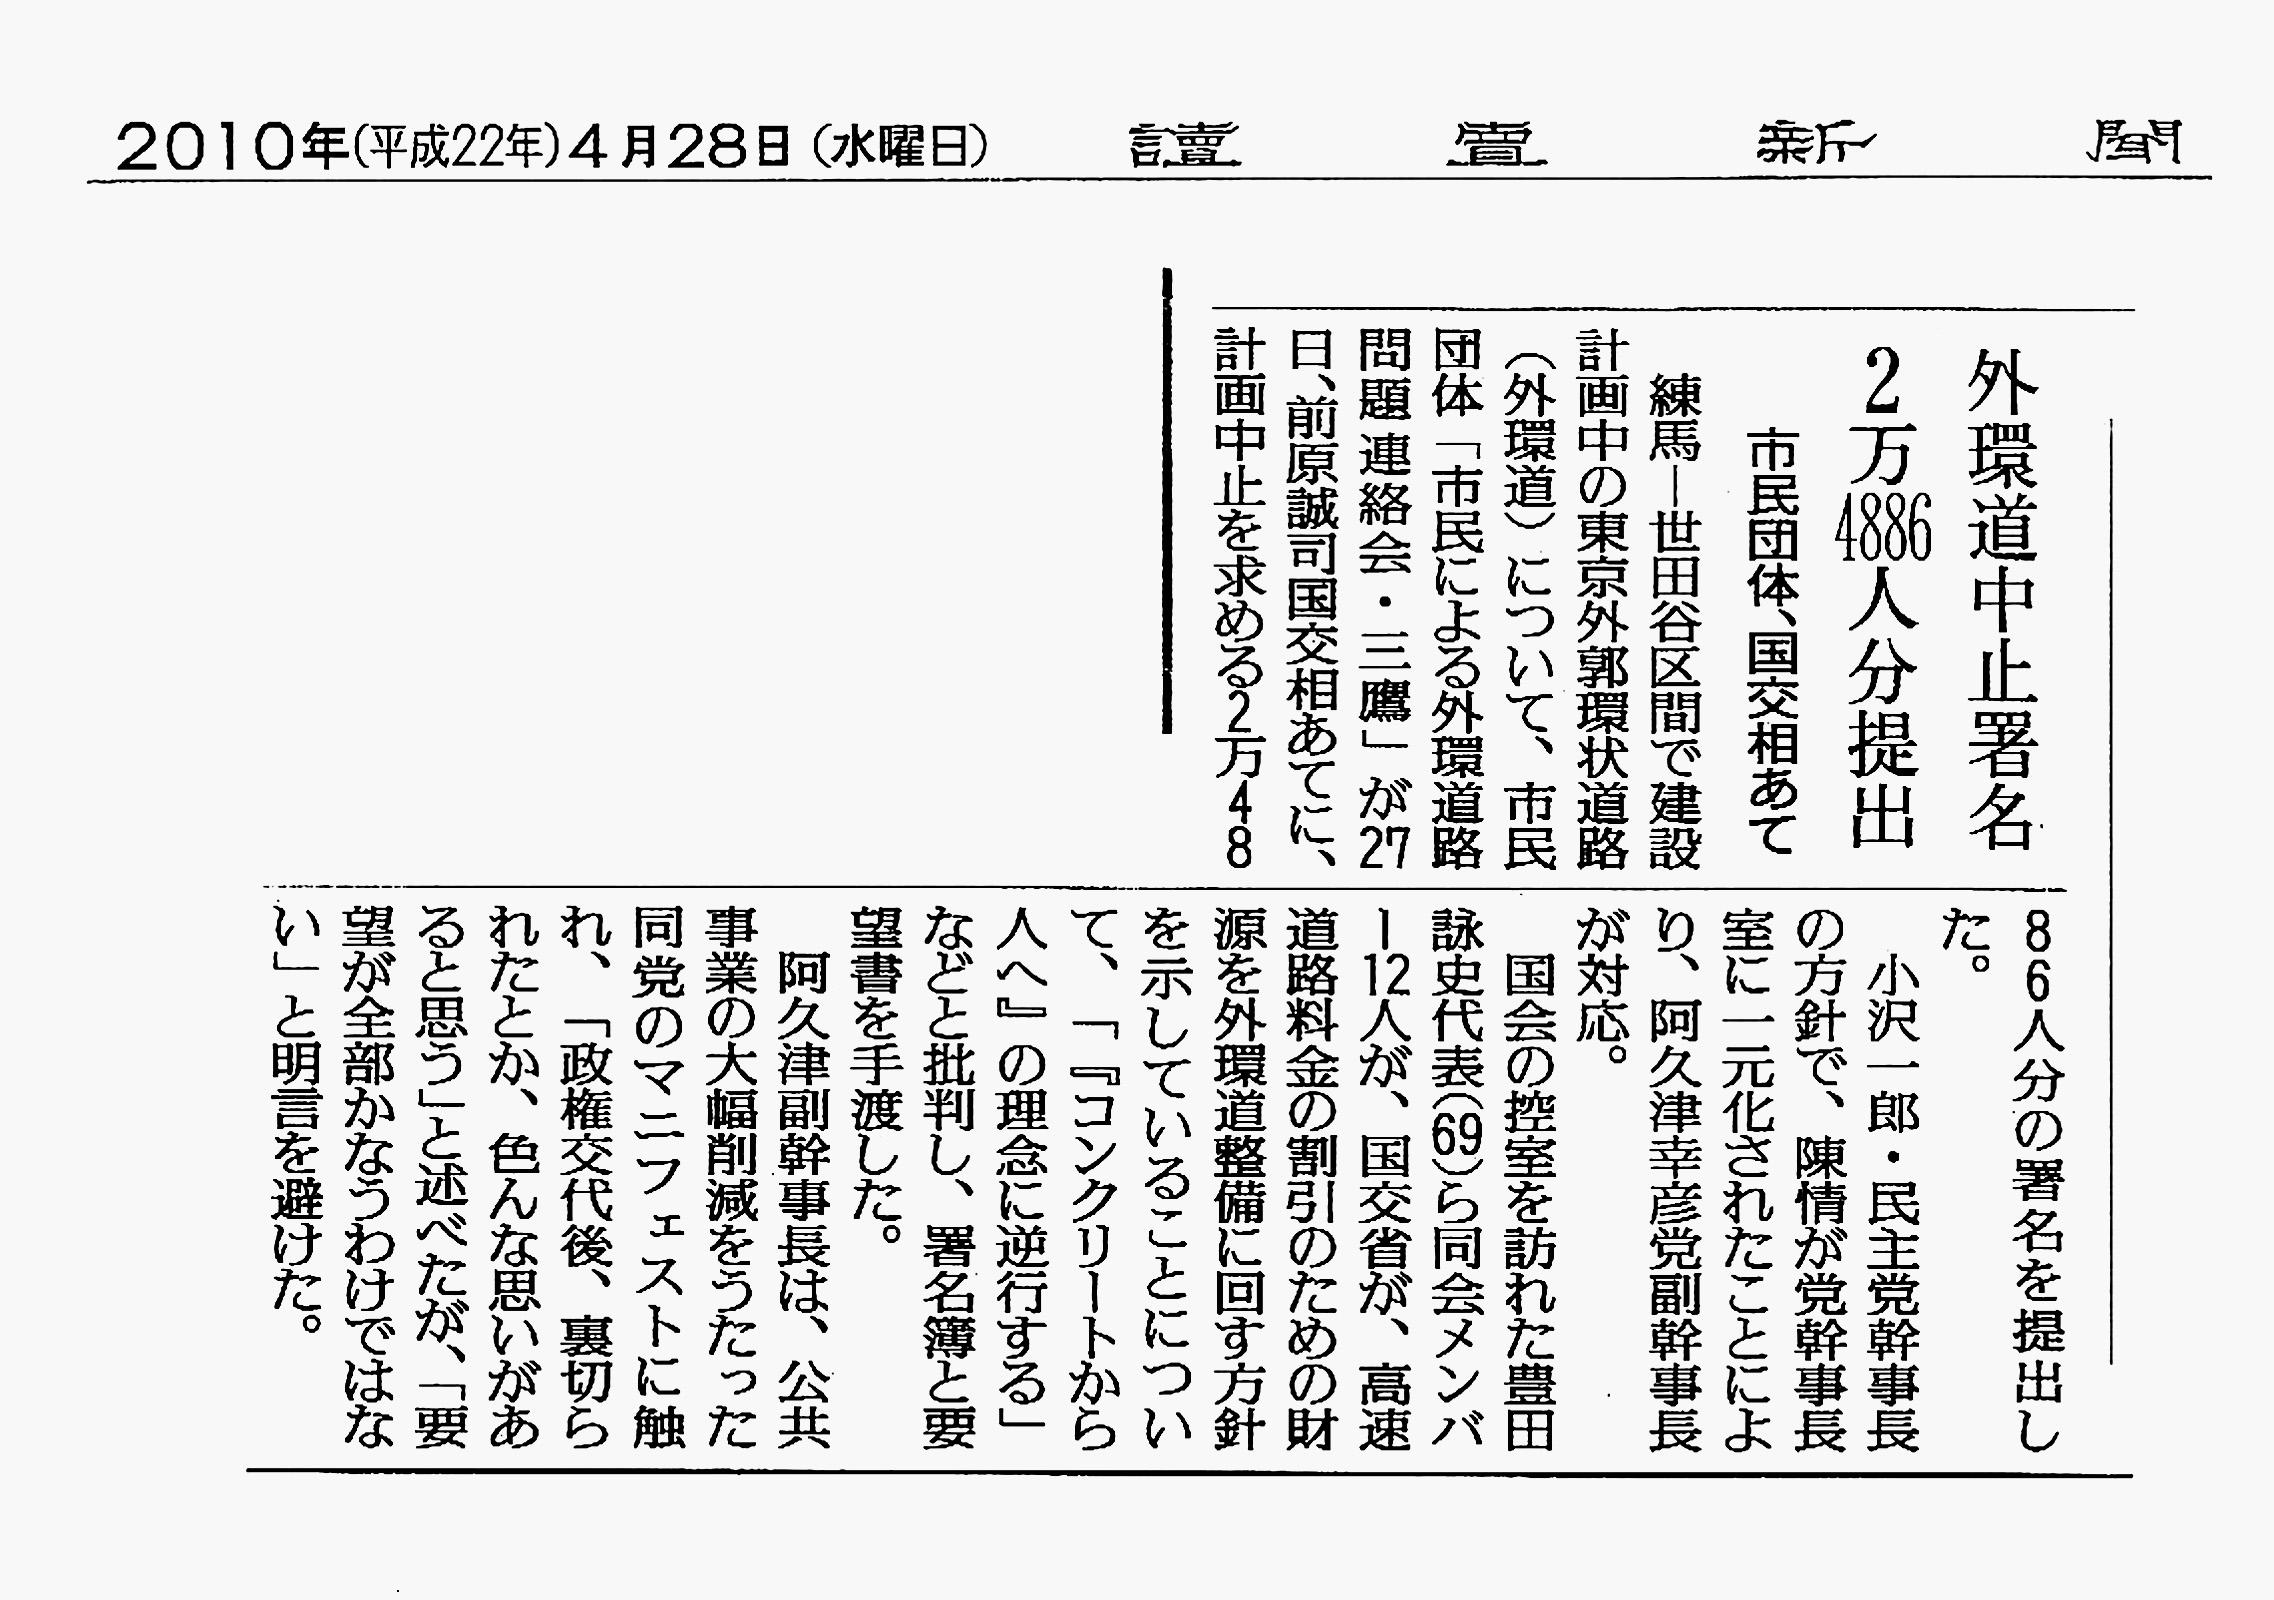 20100428yomiuri